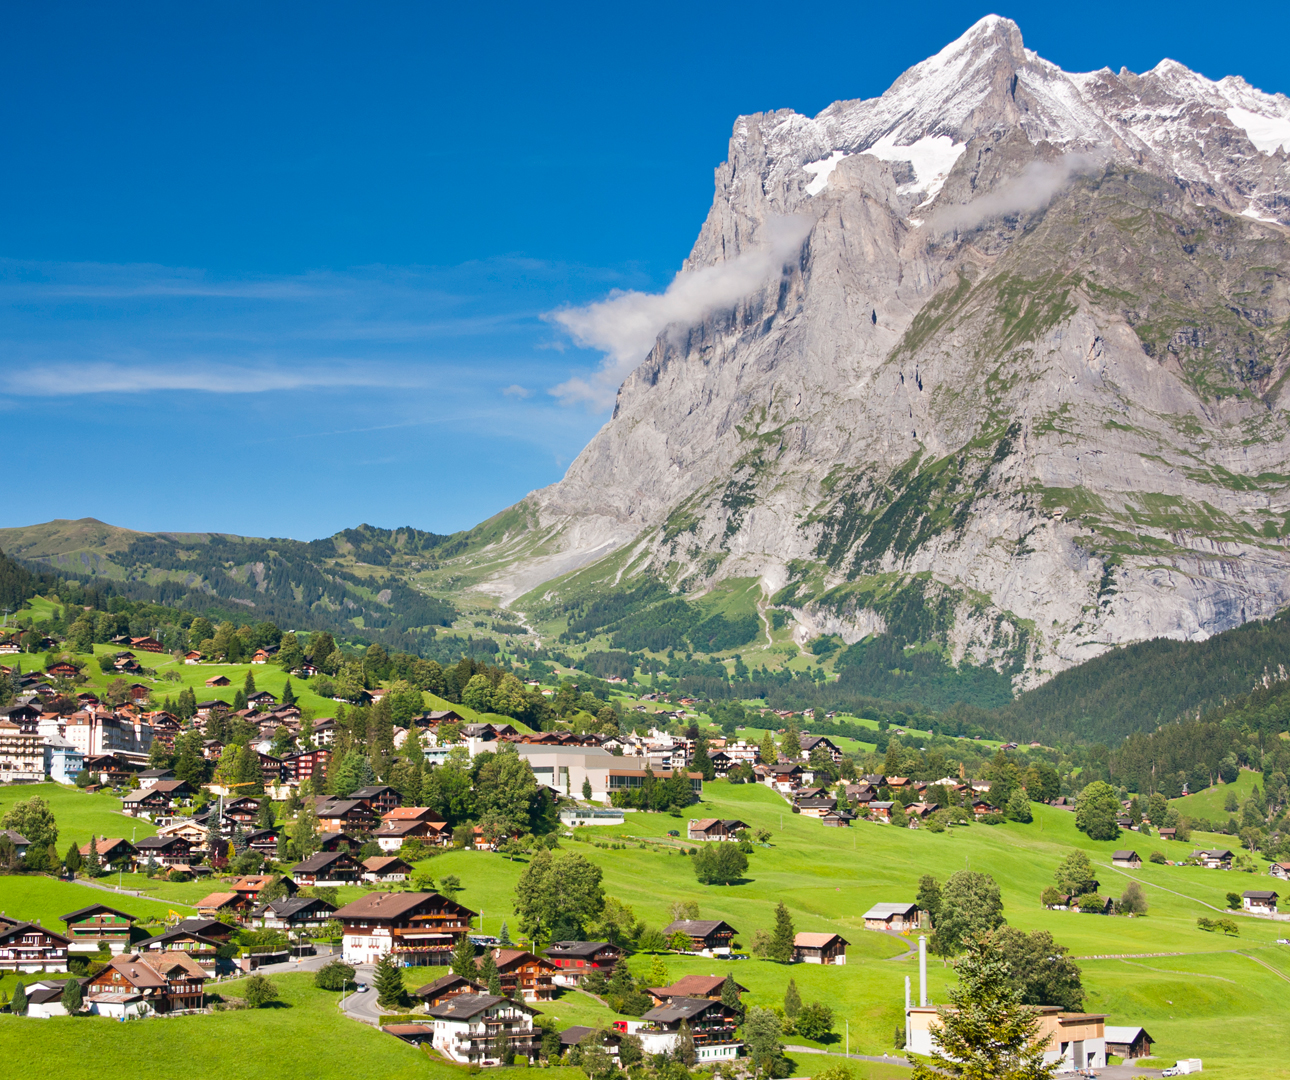 Grindelwald-And-Wetterhorn,-Swiss-Alps-iStock-MichaelUtech-www.istockphoto